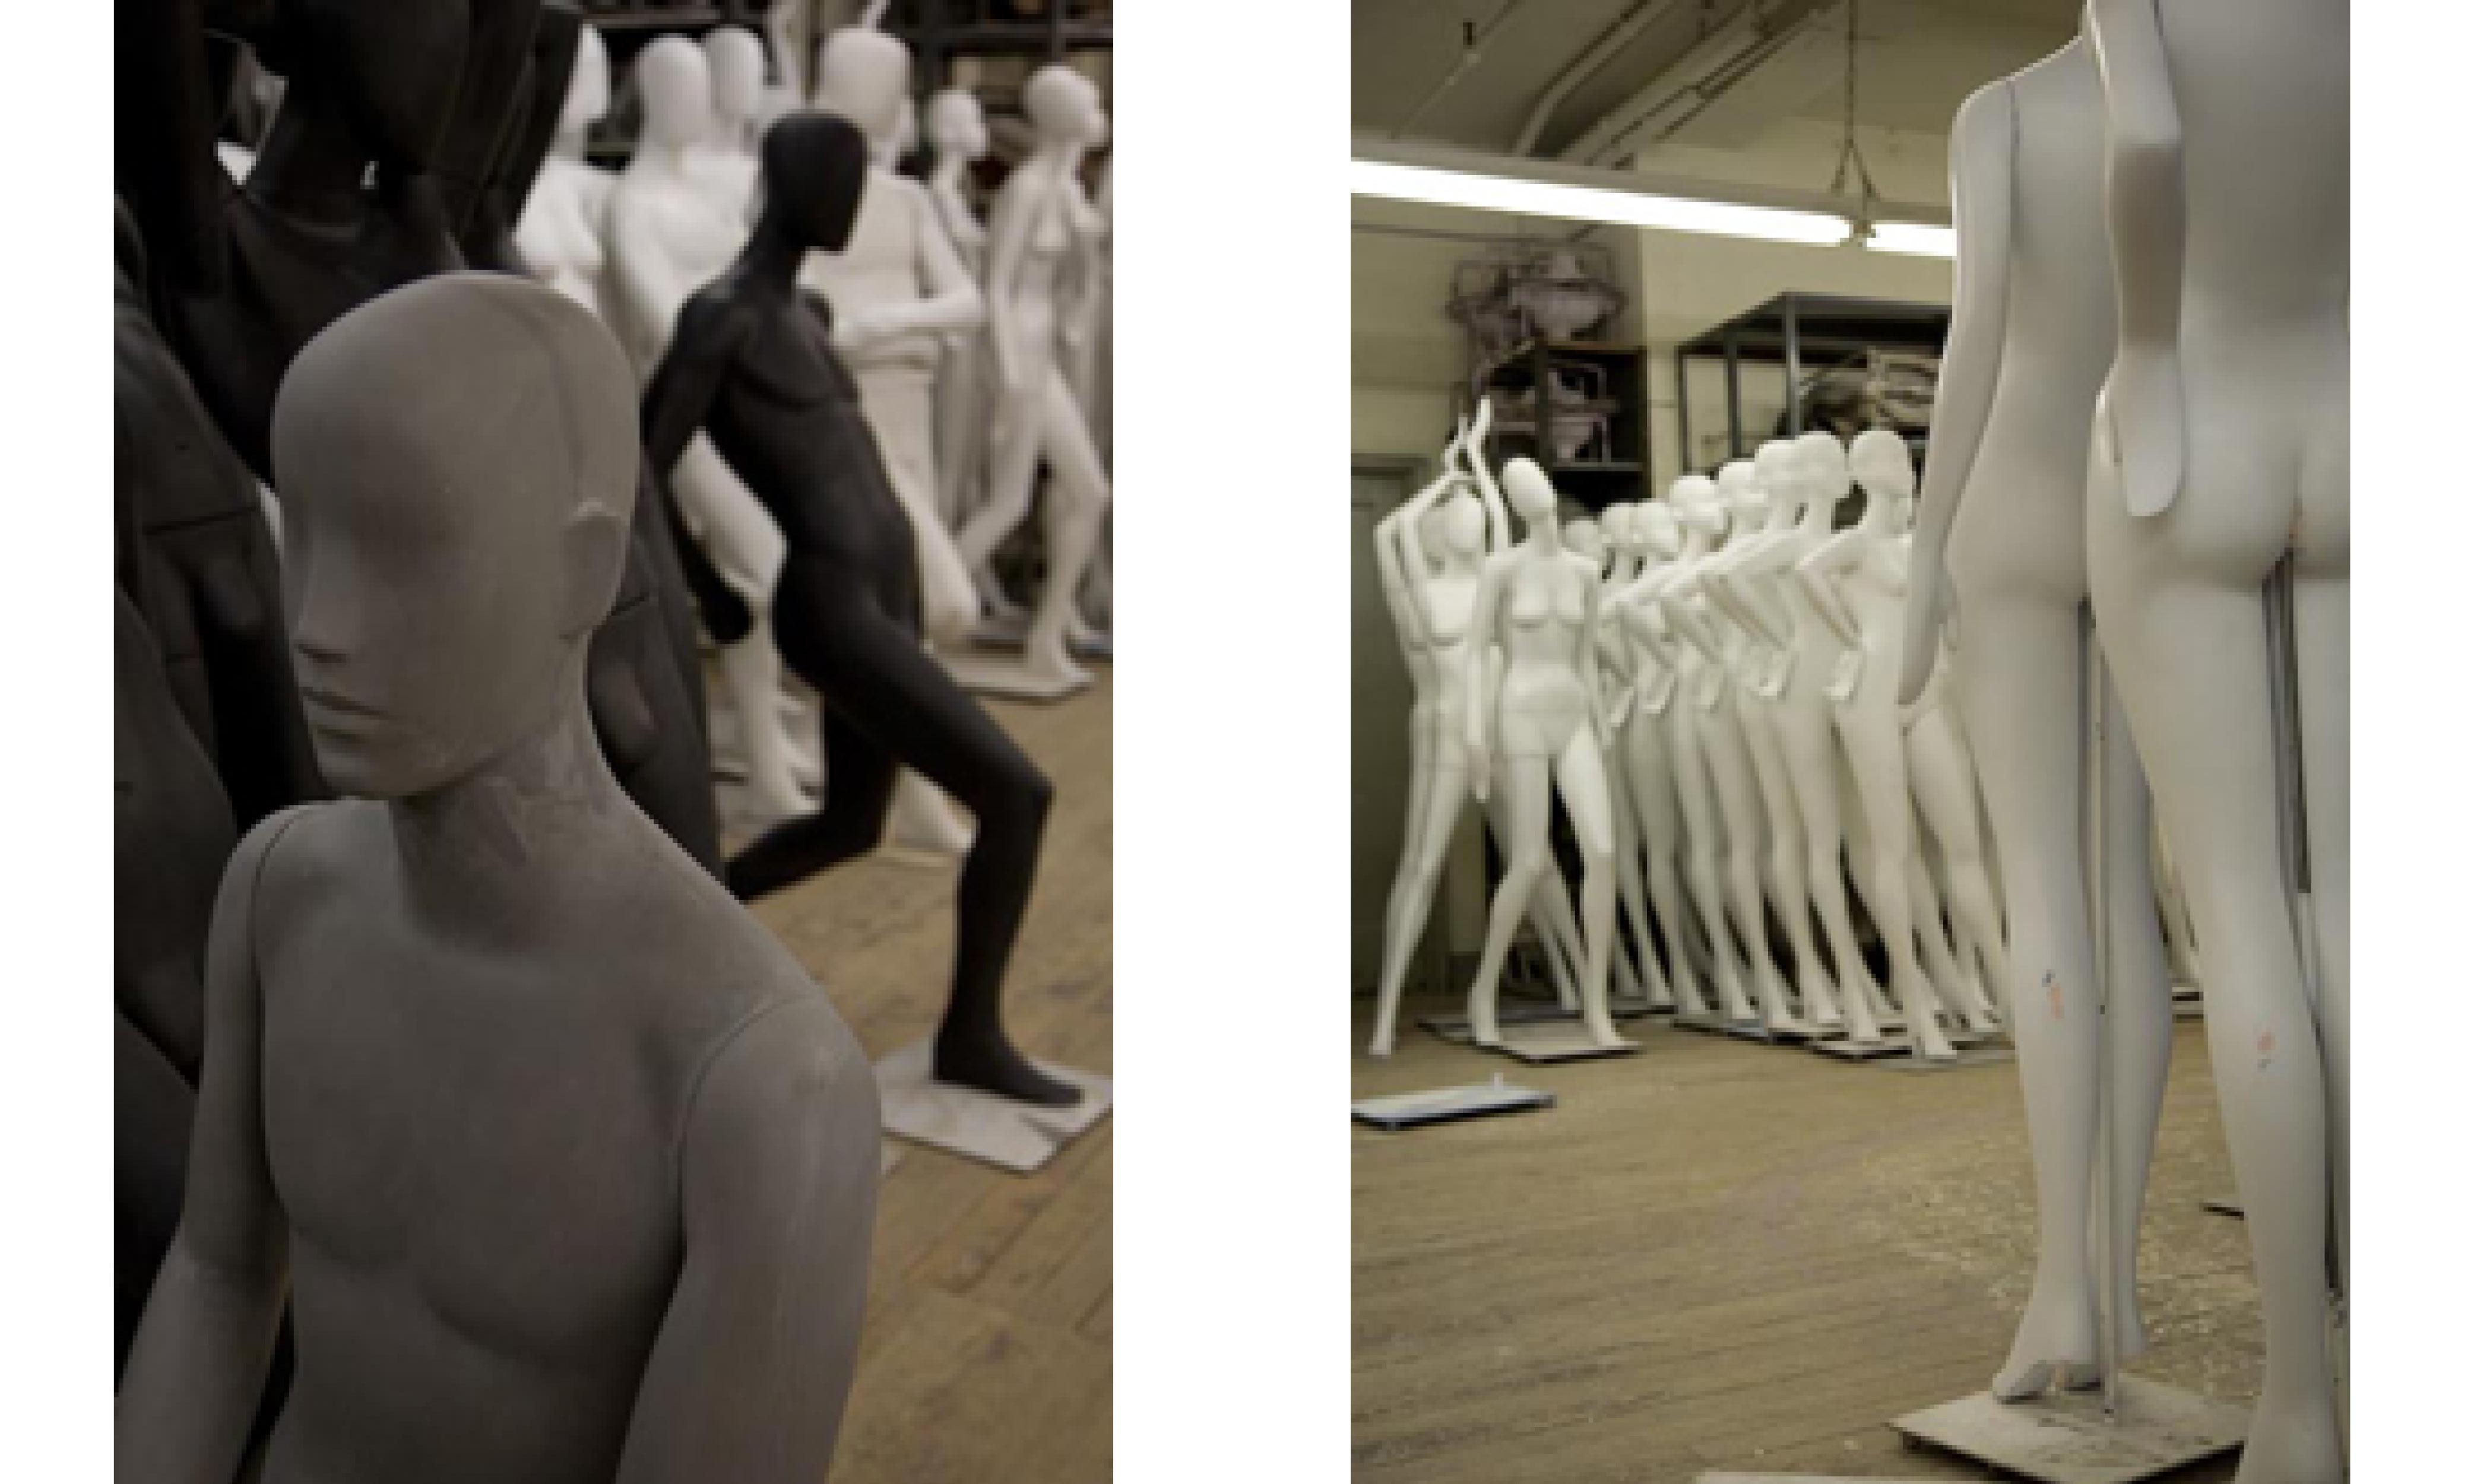 New York mannequin factory for OBJEKT international magazine